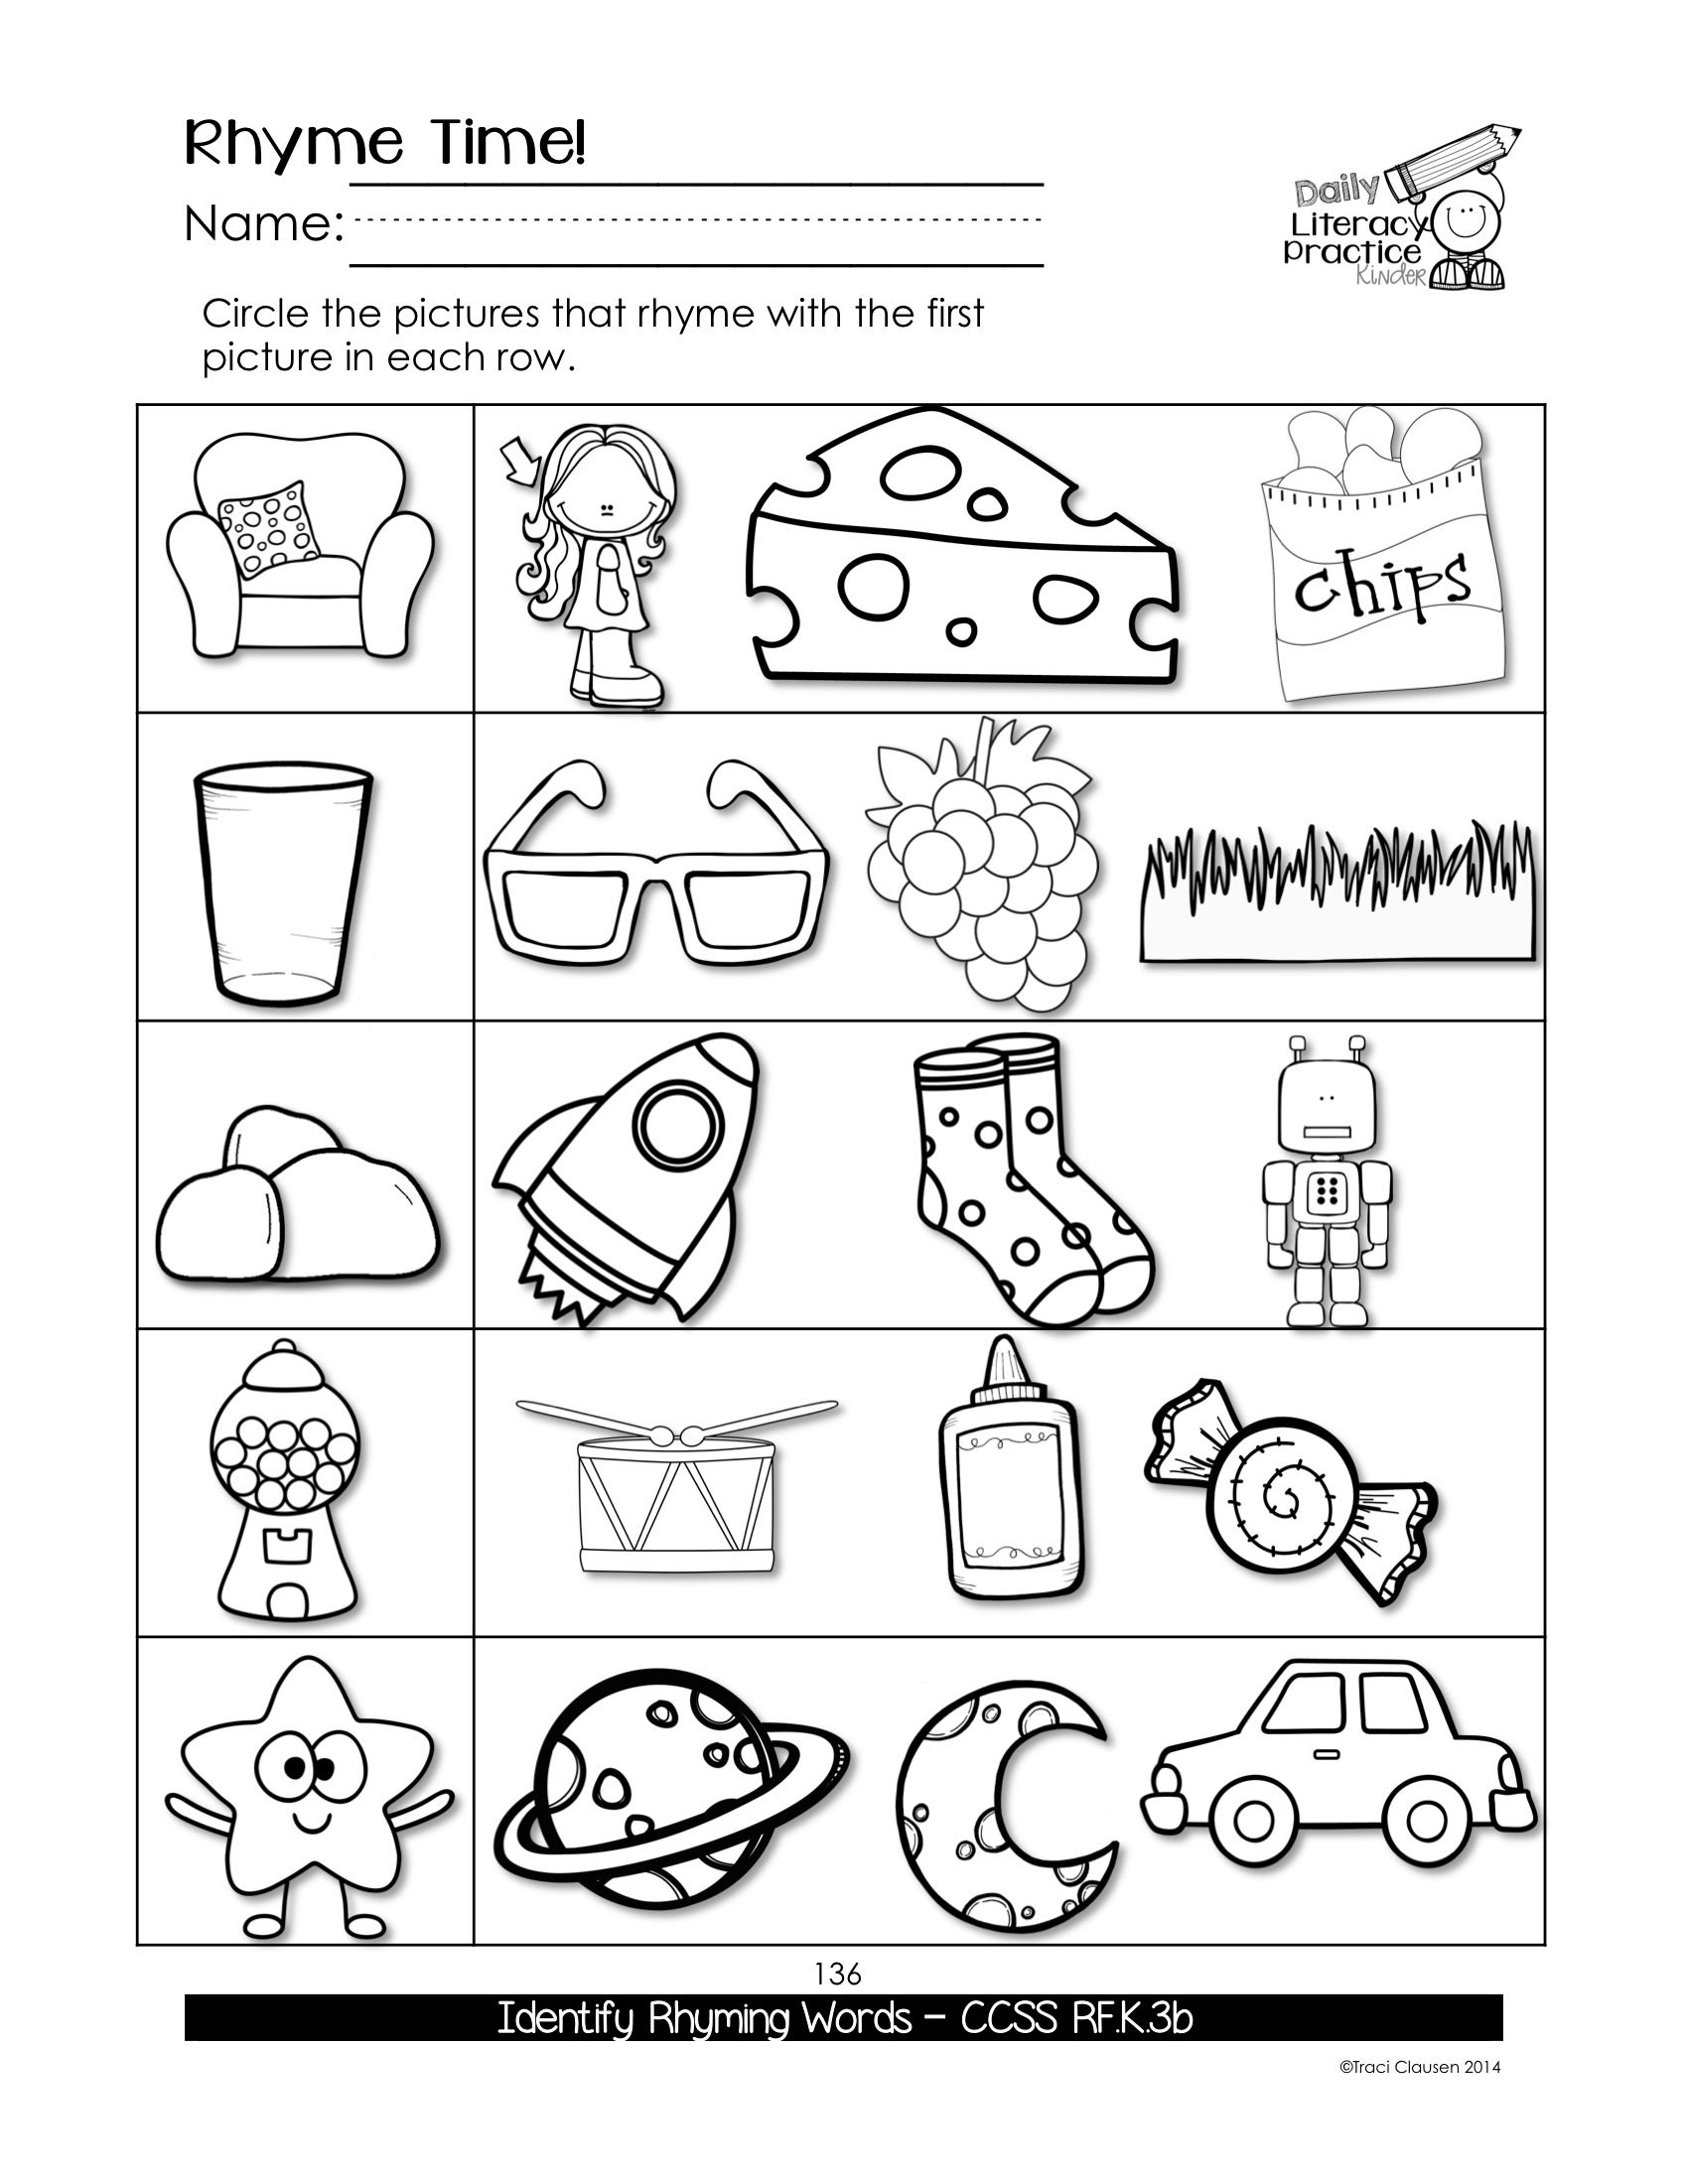 Kindergarten Phonics Sight Words Practice Daily Literacy Social Studies Worksheets Rhyming Worksheet Kindergarten Phonics Worksheets [ 2200 x 1700 Pixel ]